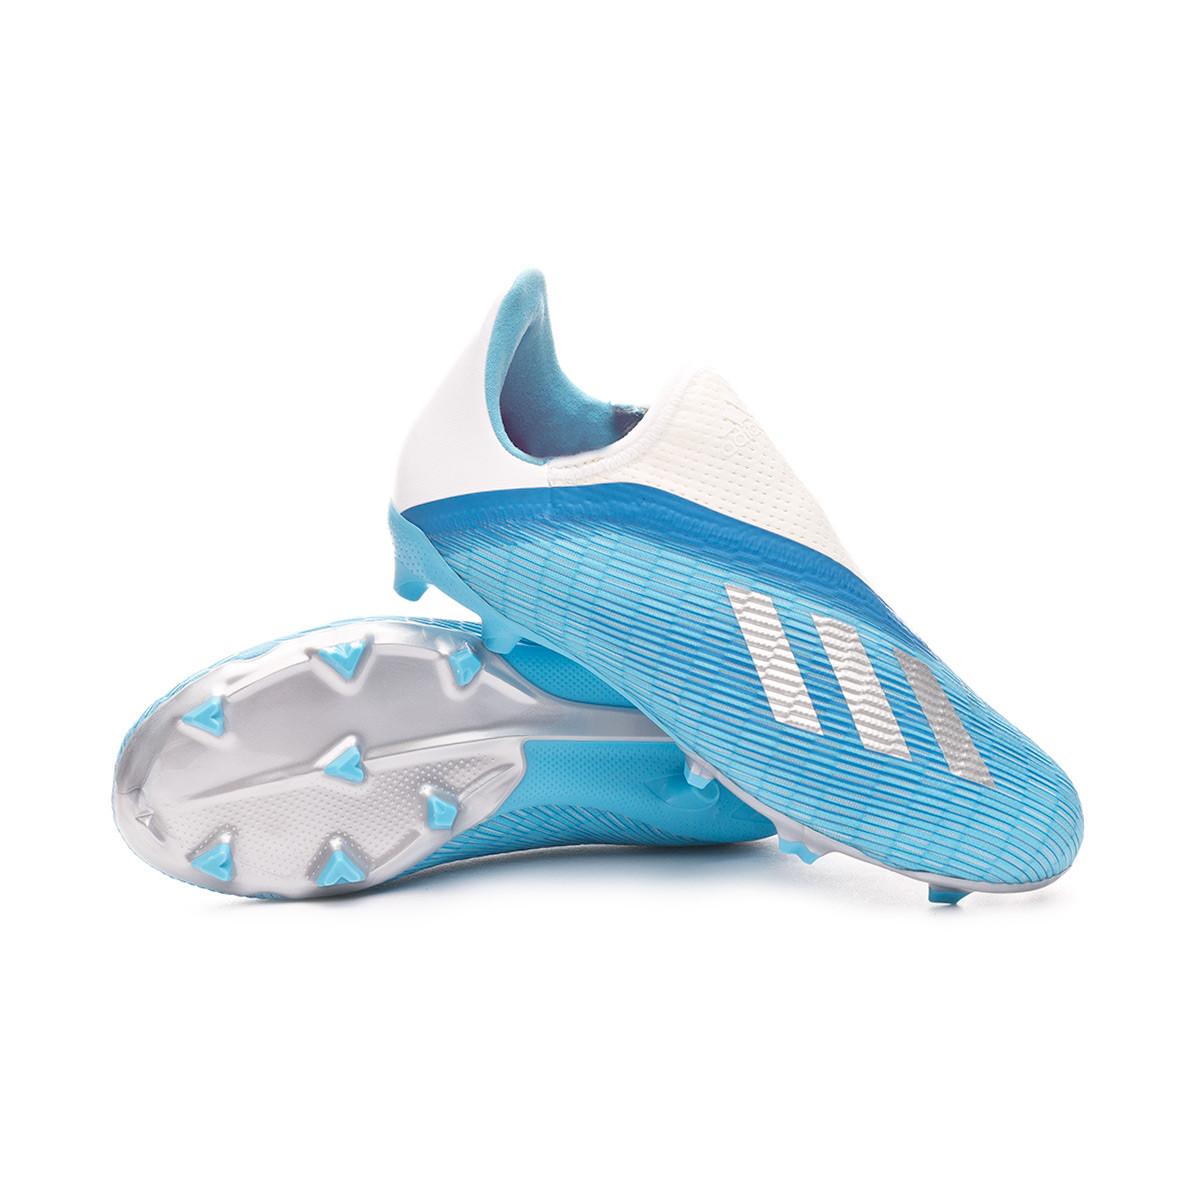 Bota de fútbol adidas X 19.3 FG Niño Bright cyan Core black